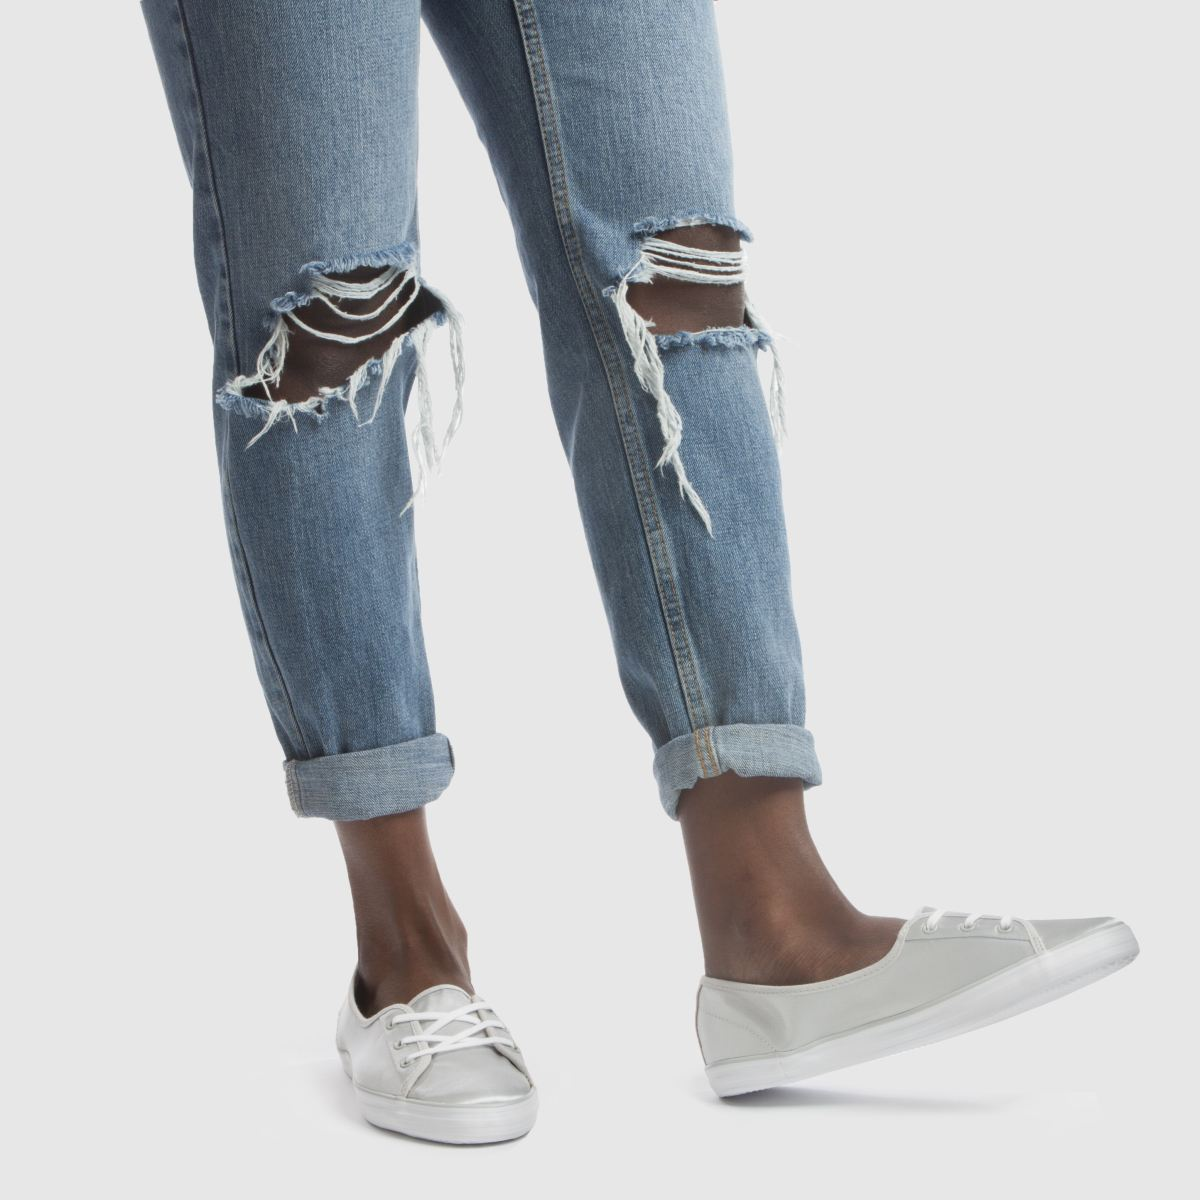 Damen Hellgrau lacoste Qualität Ziane Chunky Sneaker | schuh Gute Qualität lacoste beliebte Schuhe af187b